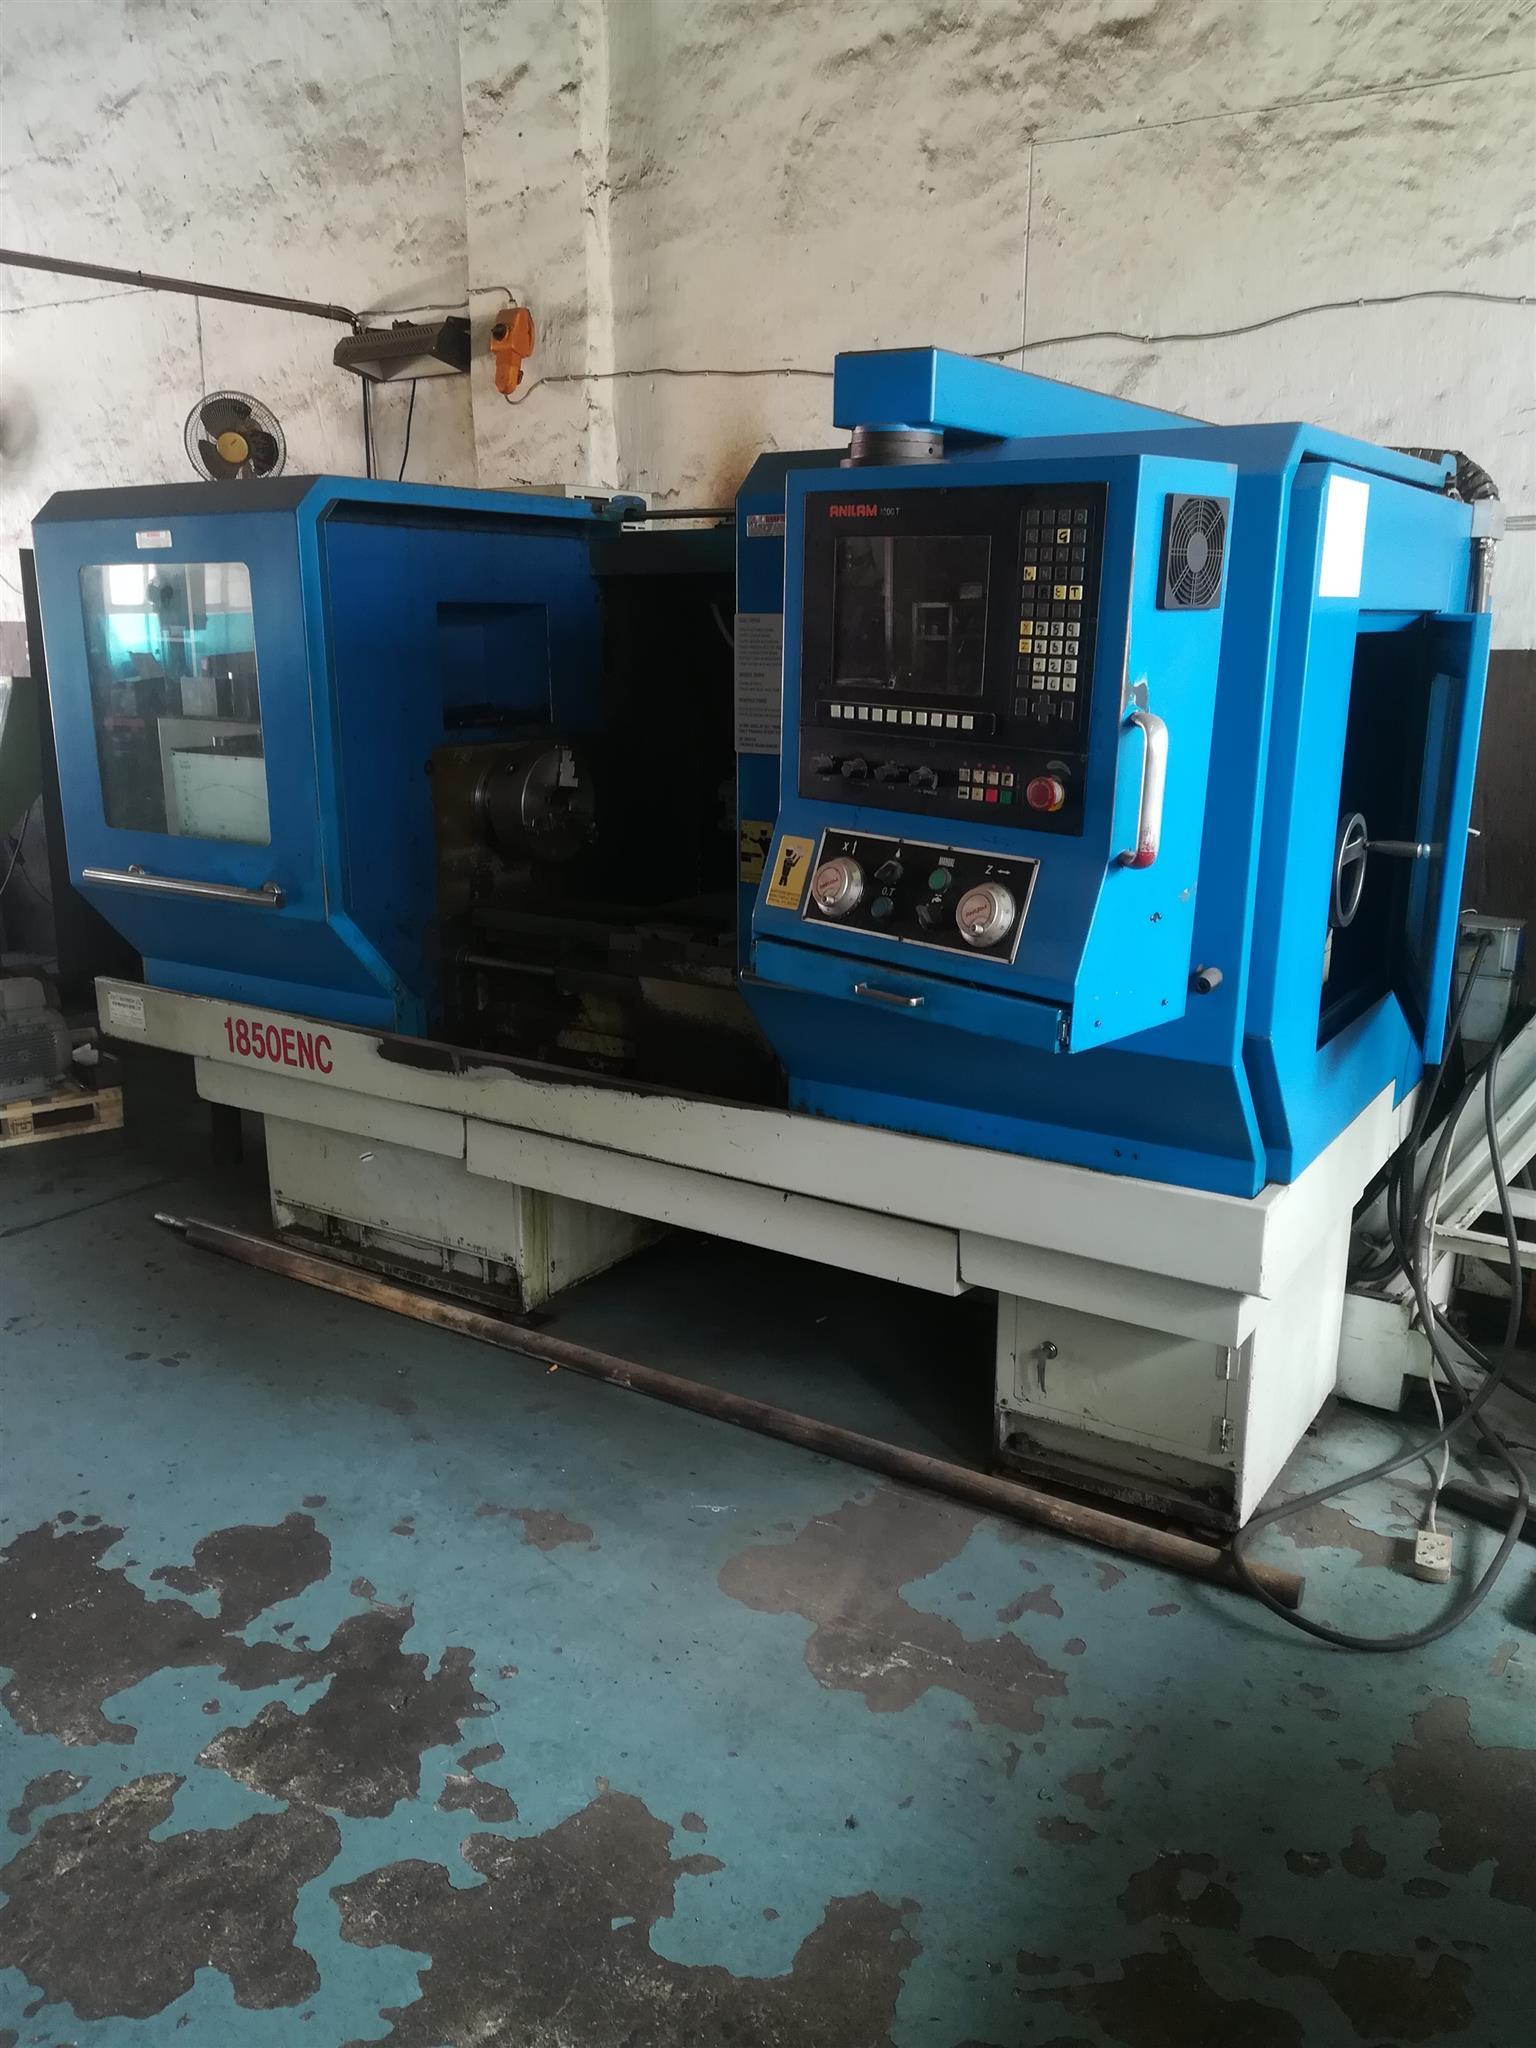 Jesco CNC lathe for sale